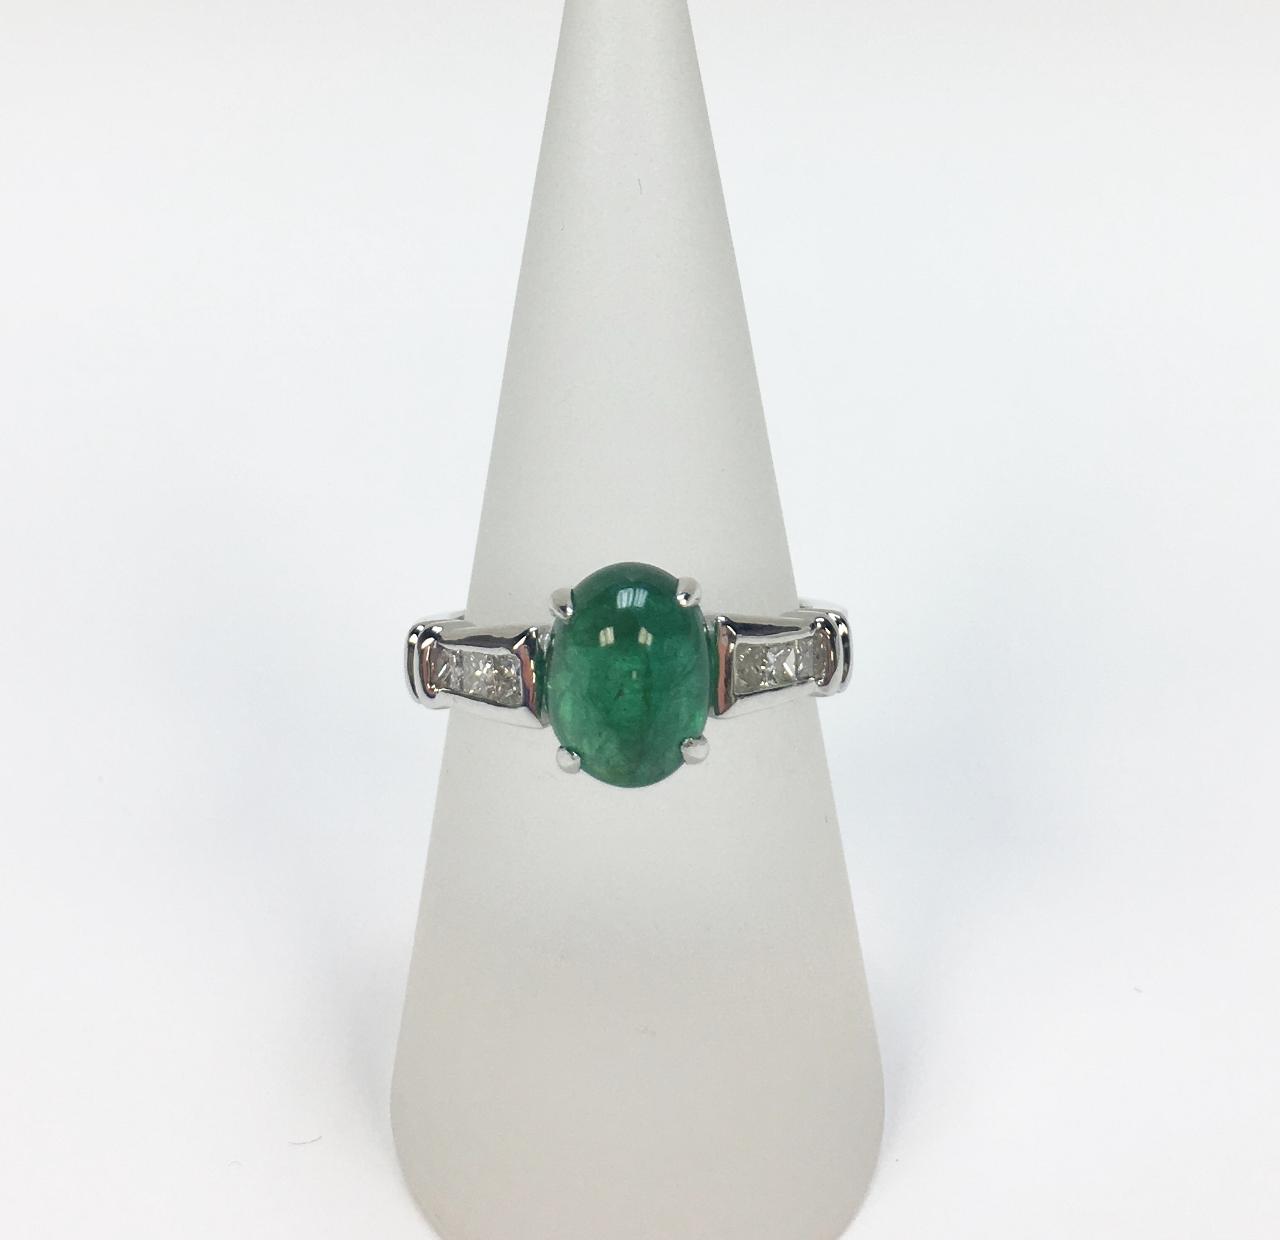 2.65 Carats Cabochon Emerald Diamond Ring